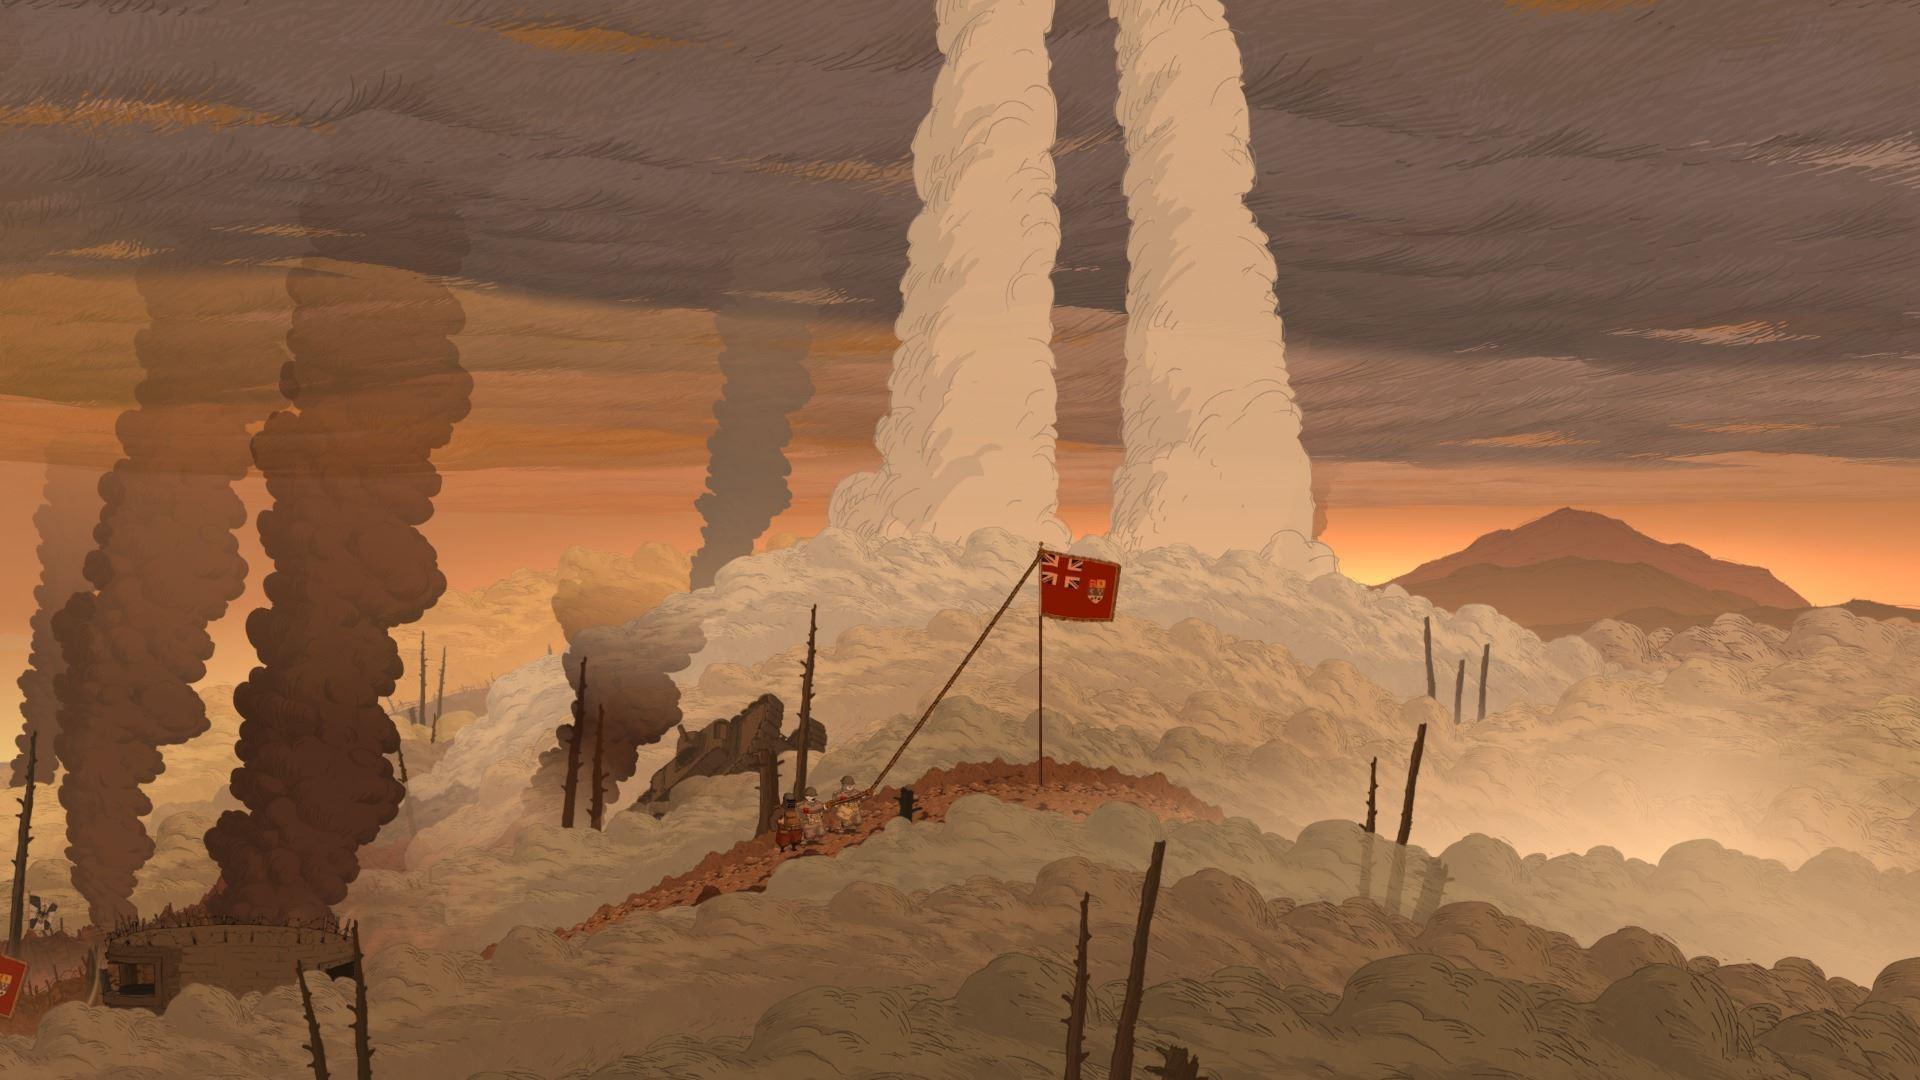 Детсадовский пехотинец. Рецензия на Valiant hearts: The Great War - Изображение 11